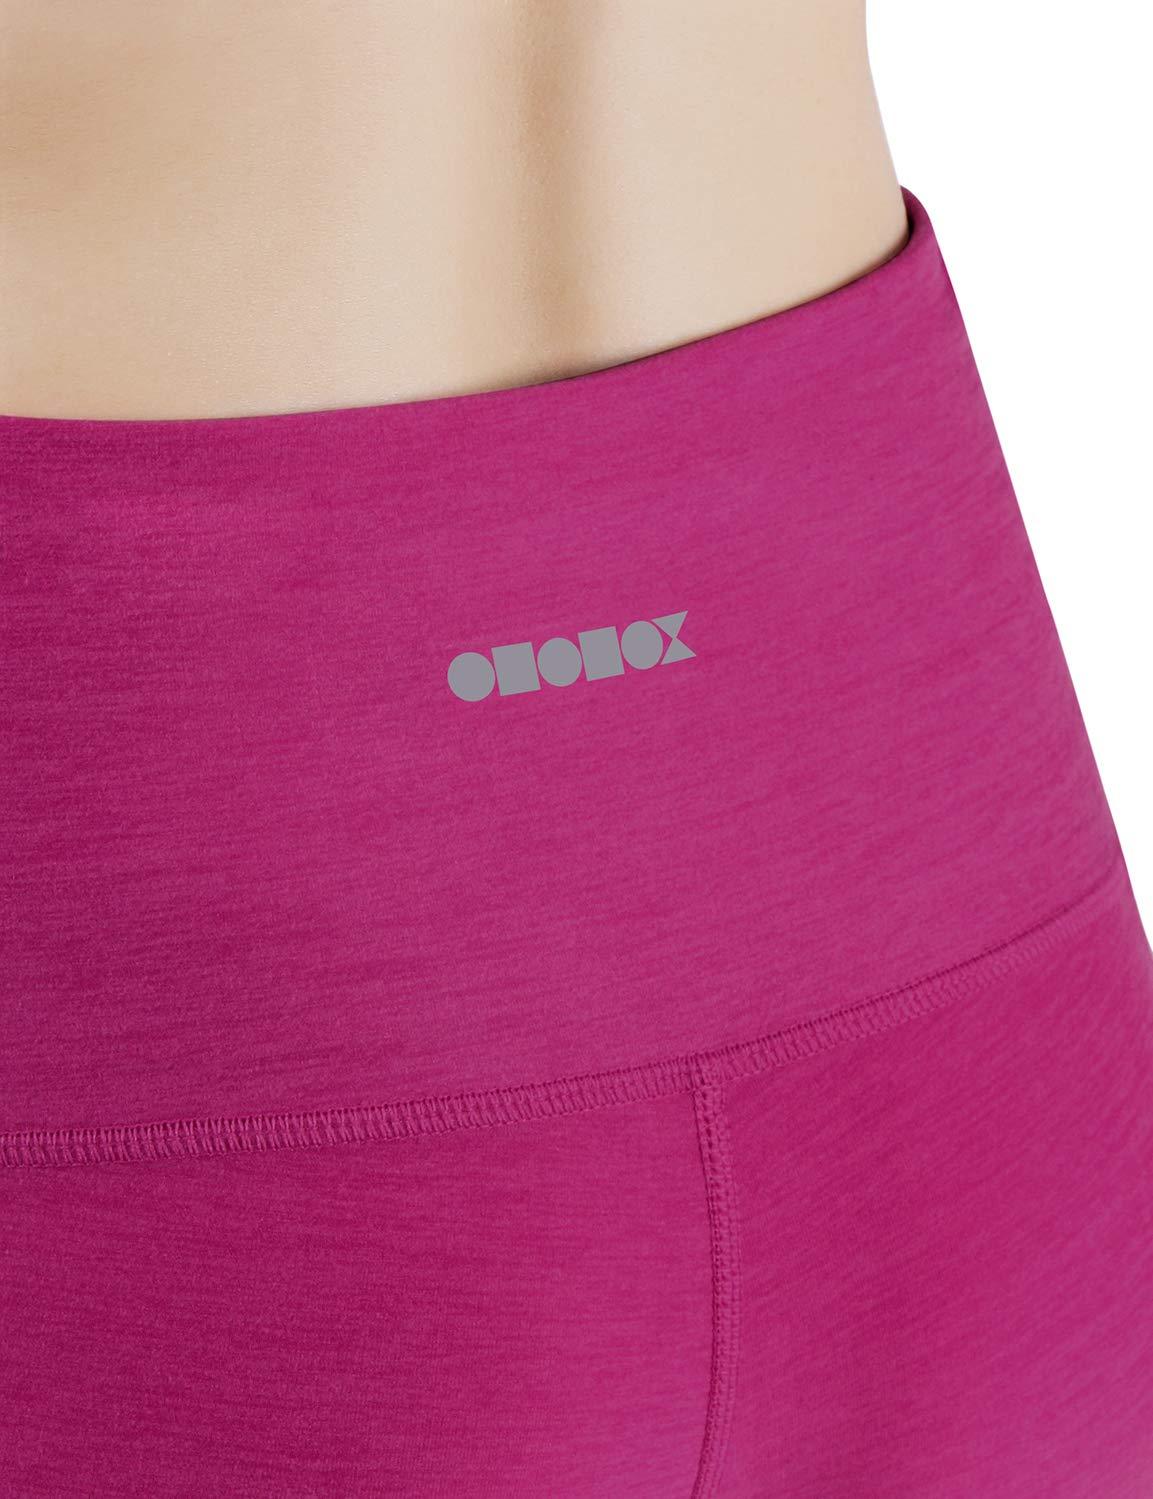 ODODOS High Waist Out Pocket Yoga Capris Pants Tummy Control Workout Running 4 Way Stretch Yoga Leggings,Fuchsia,X-Small by ODODOS (Image #5)